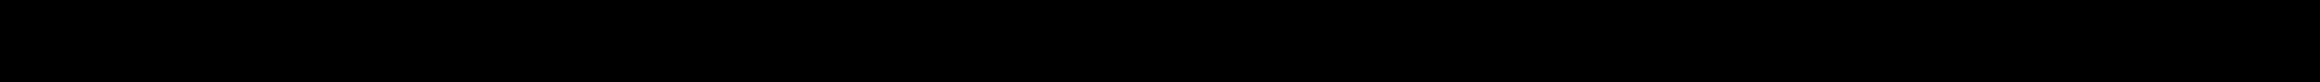 MAHLE ORIGINAL 1448616, 1477153, 1496204, 1690582, 1695529 Luftfilter